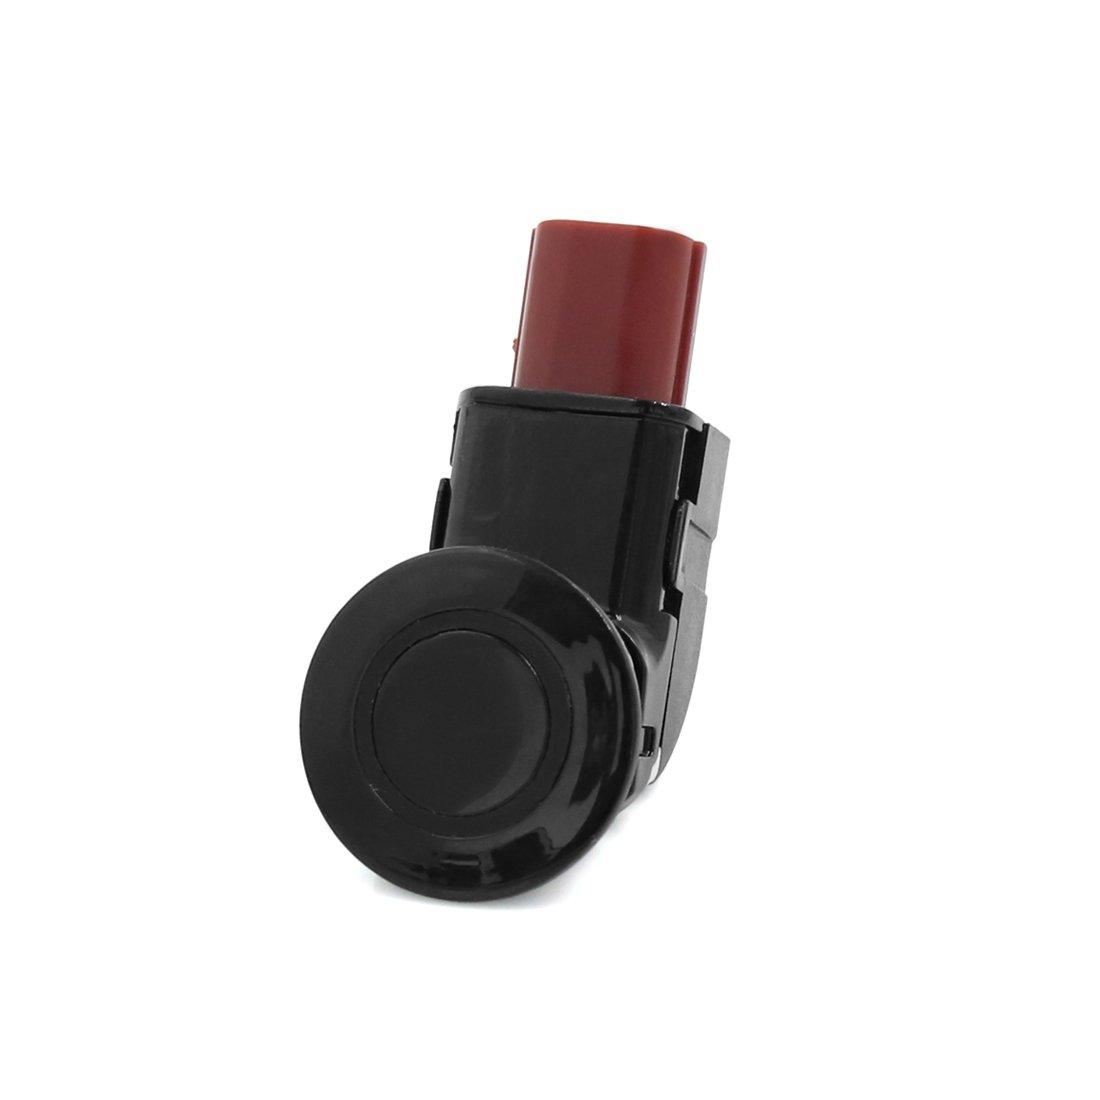 Brown 39680-SHJ-A61 PDC Bumper Parking Sensors for Honda 05-10 Odyssey 04-13 CRV Uxcell a16121300ux0617 Black